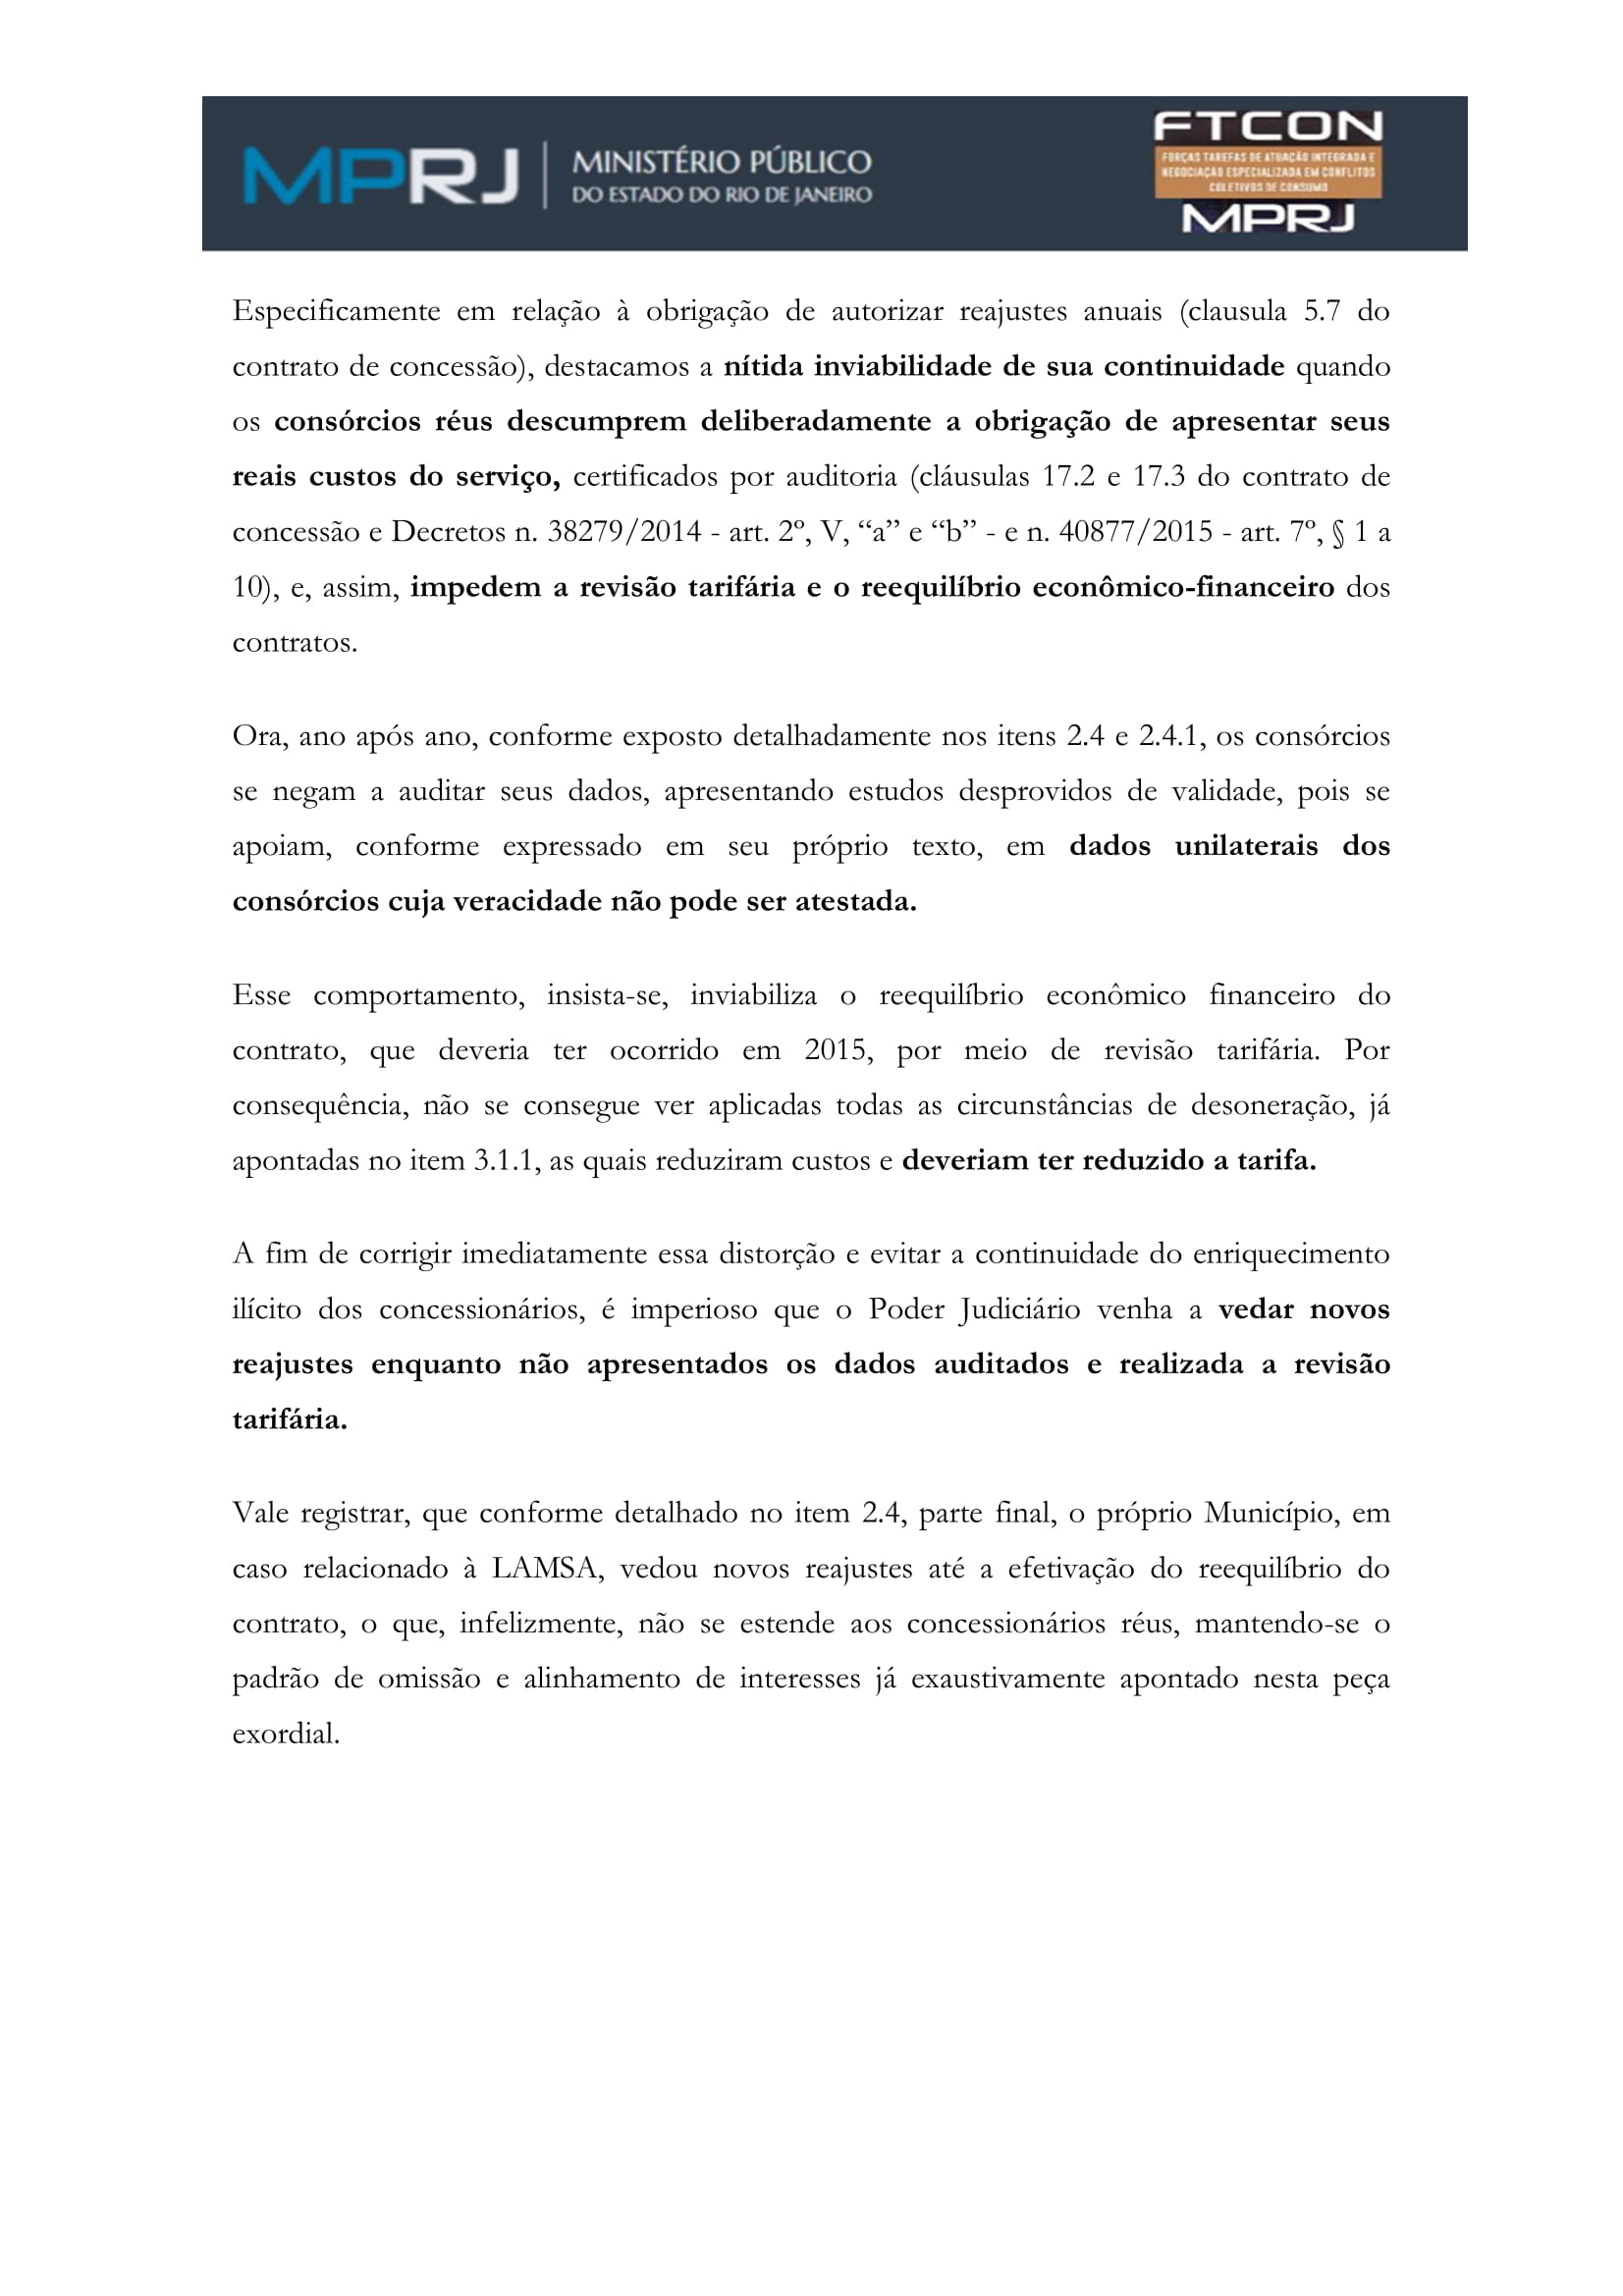 acp_caducidade_onibus_dr_rt-127